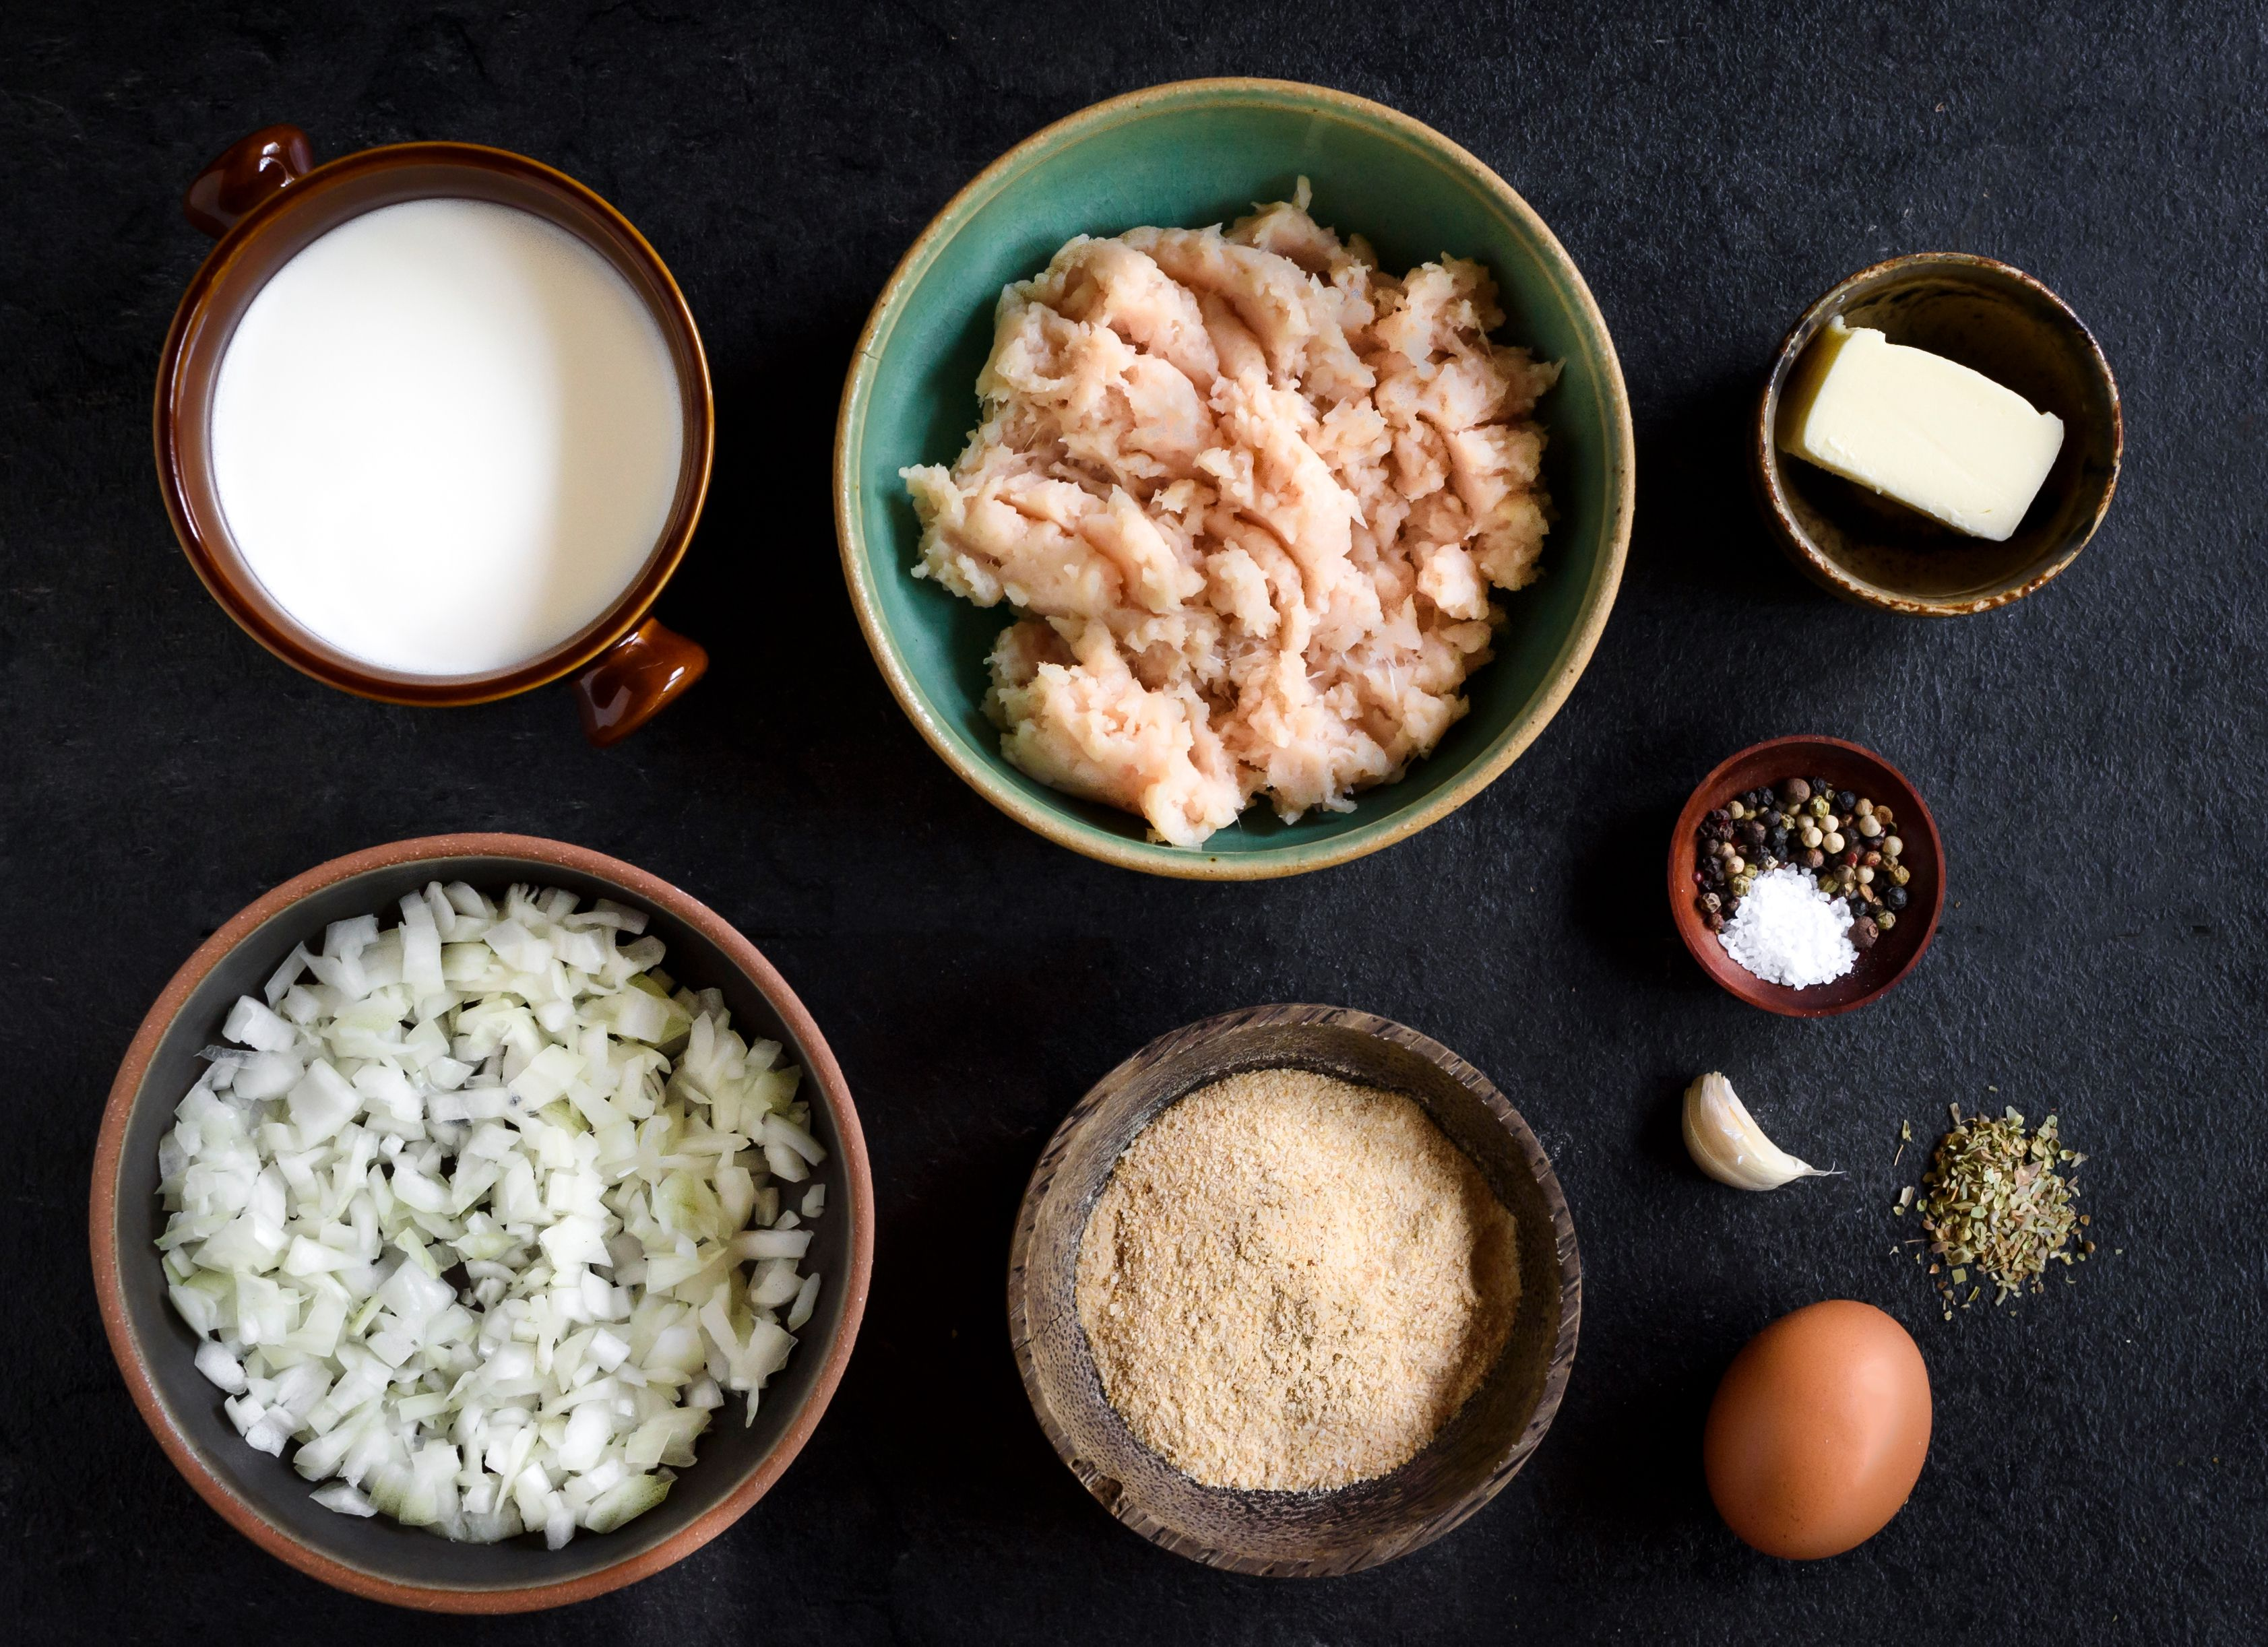 Baked Chicken Meatball Recipe ingredients